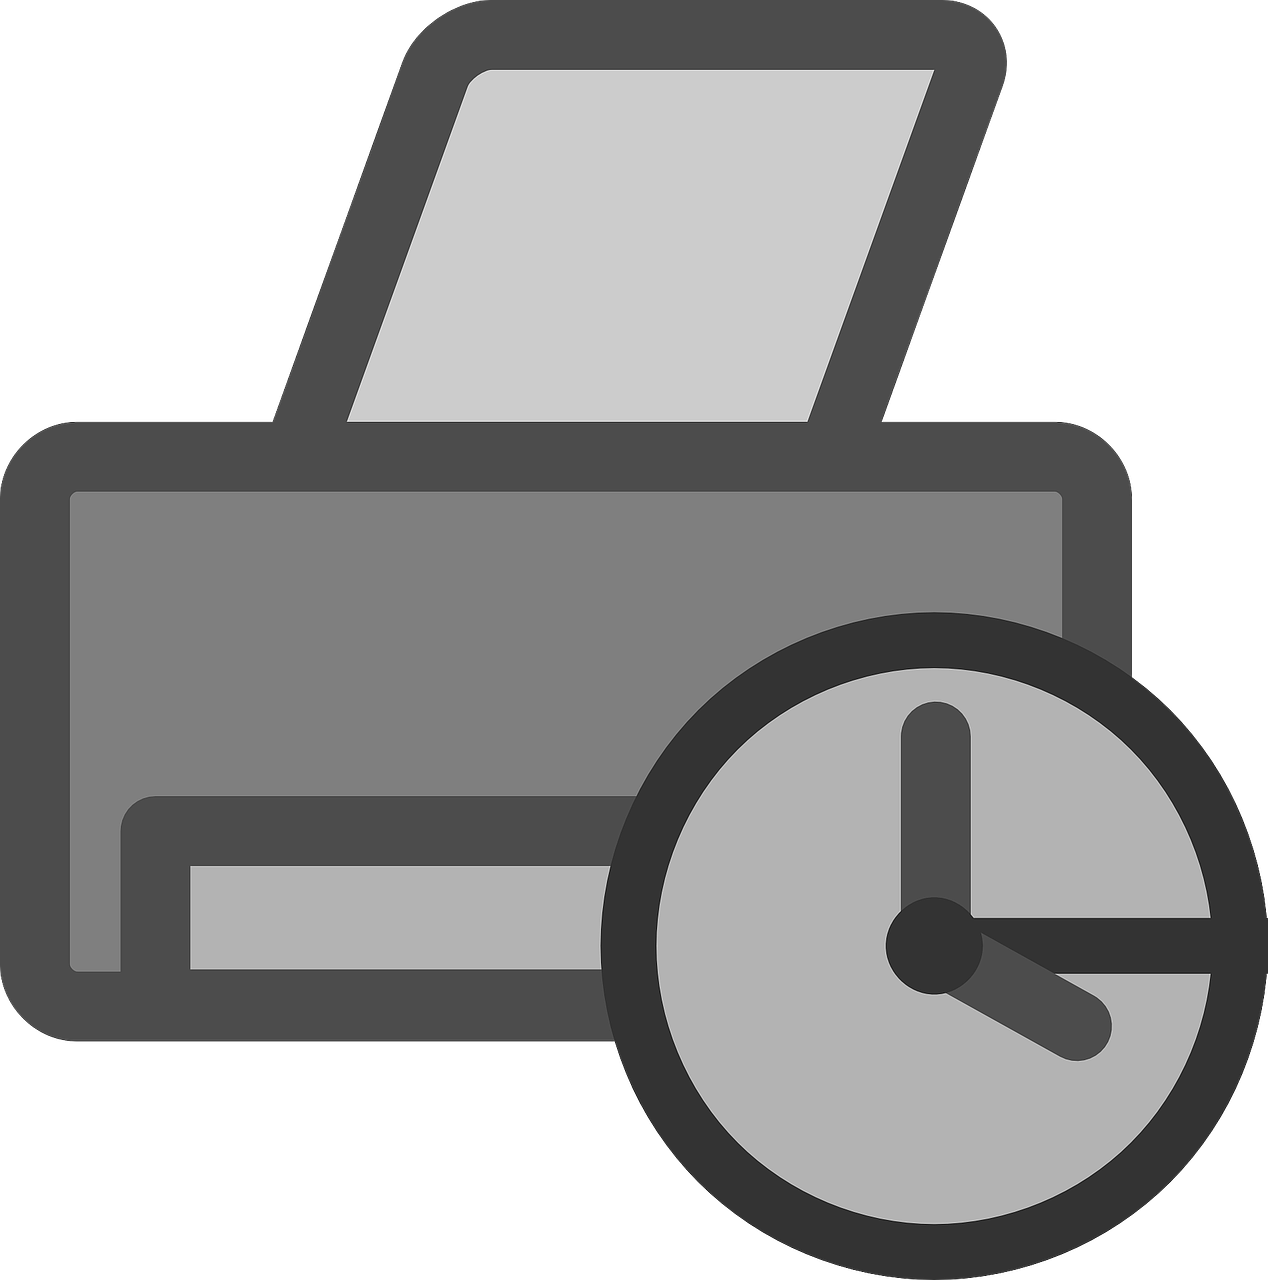 Icone d'une imprimante